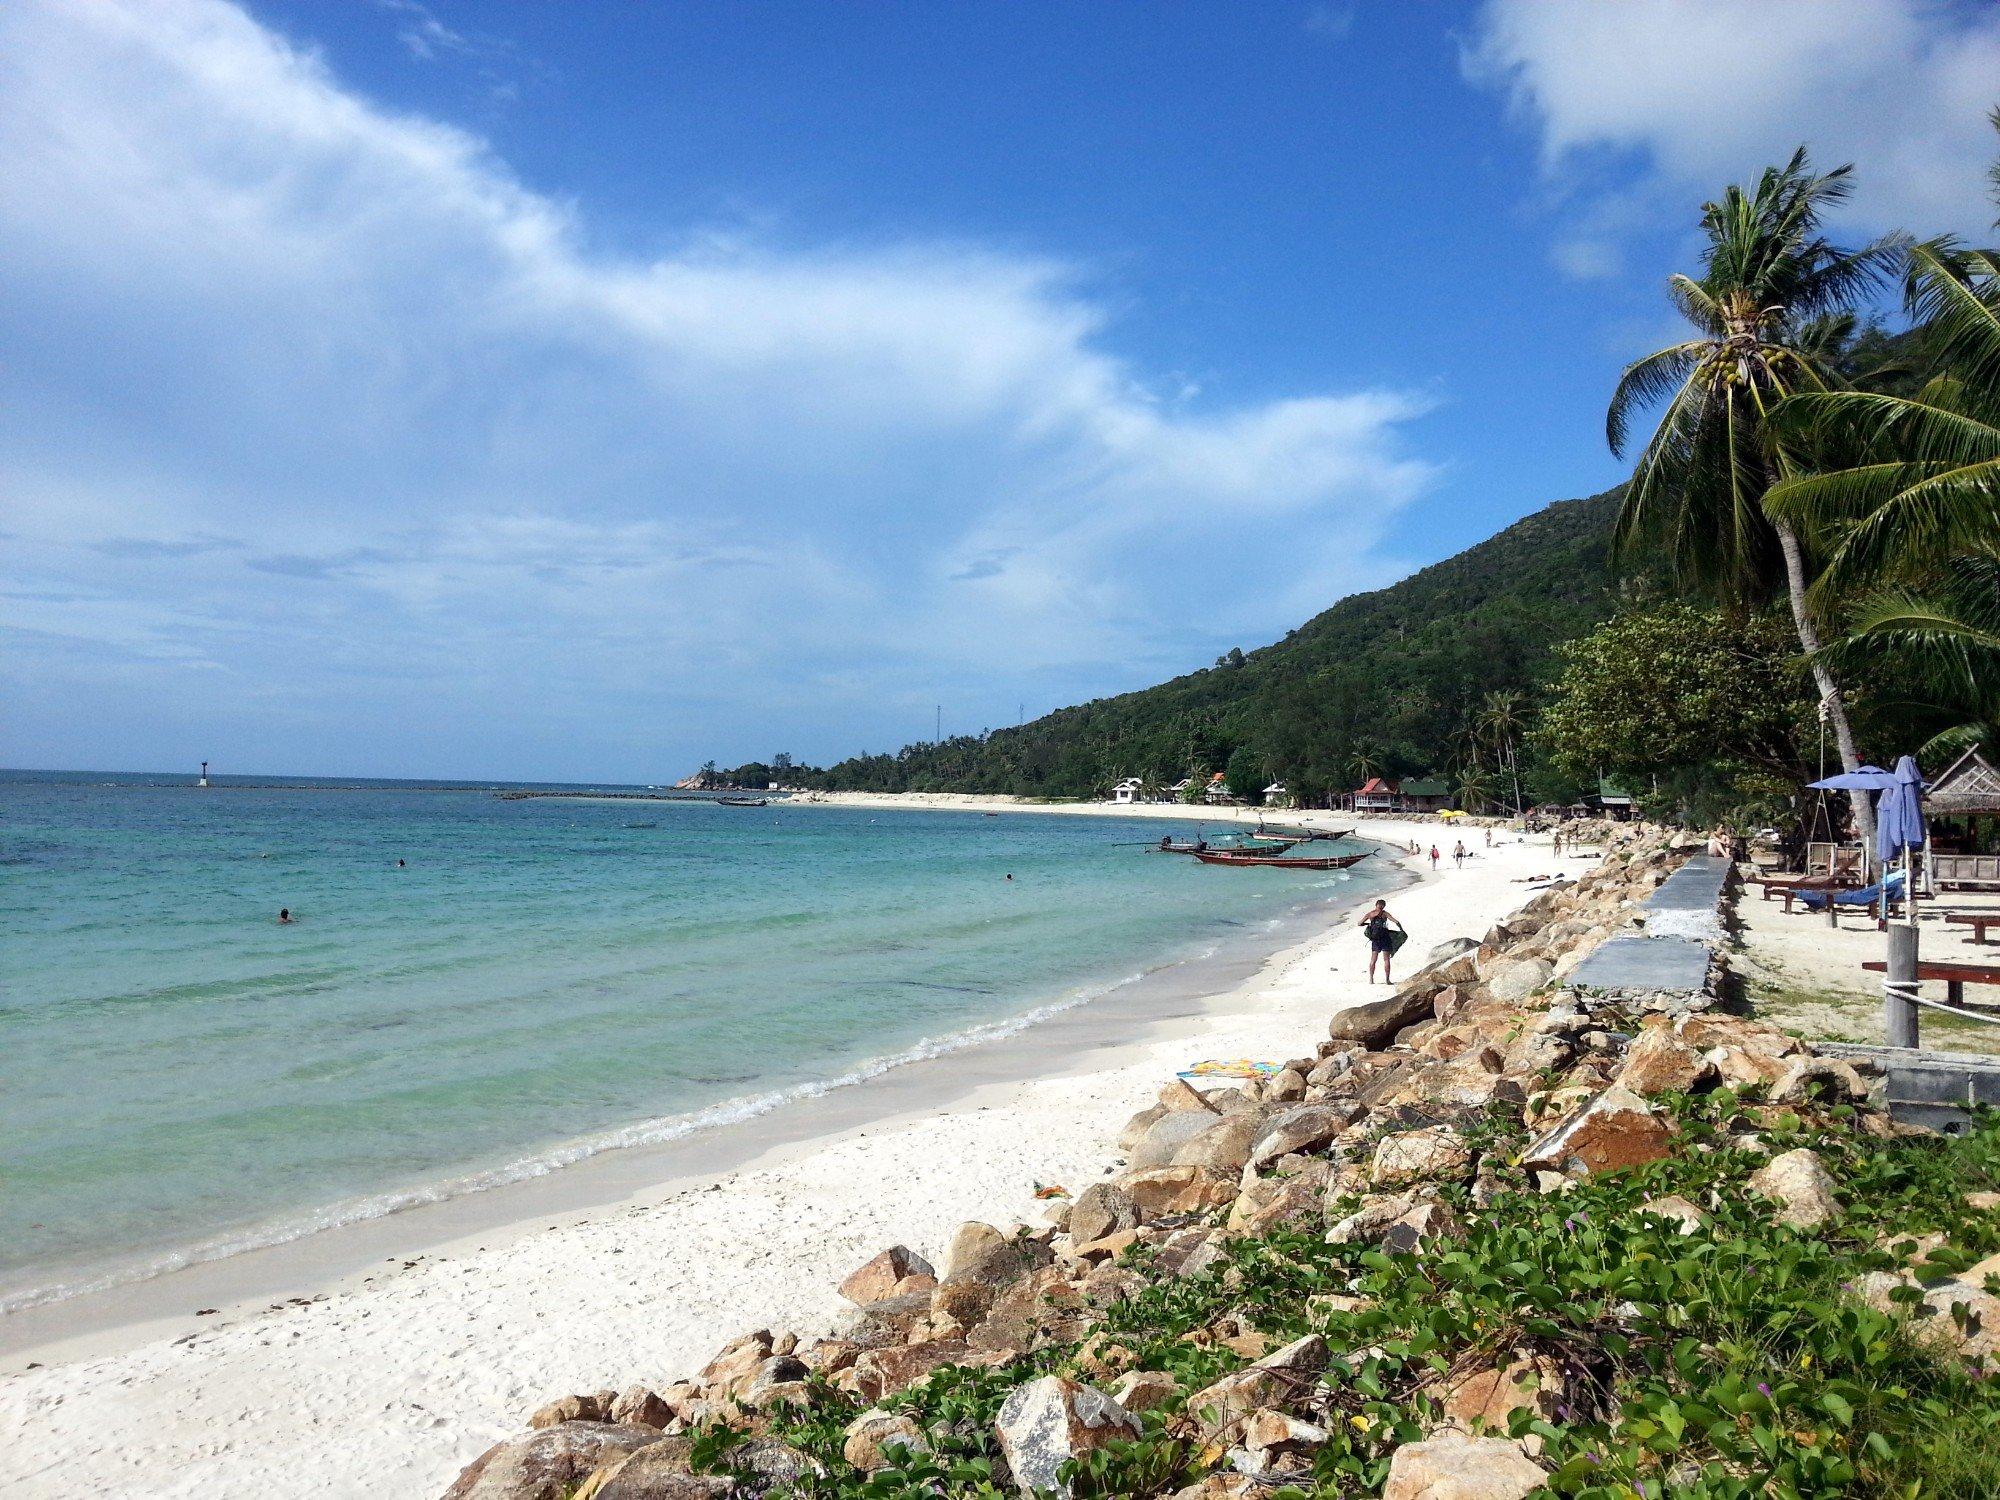 North coast of Koh Phangan